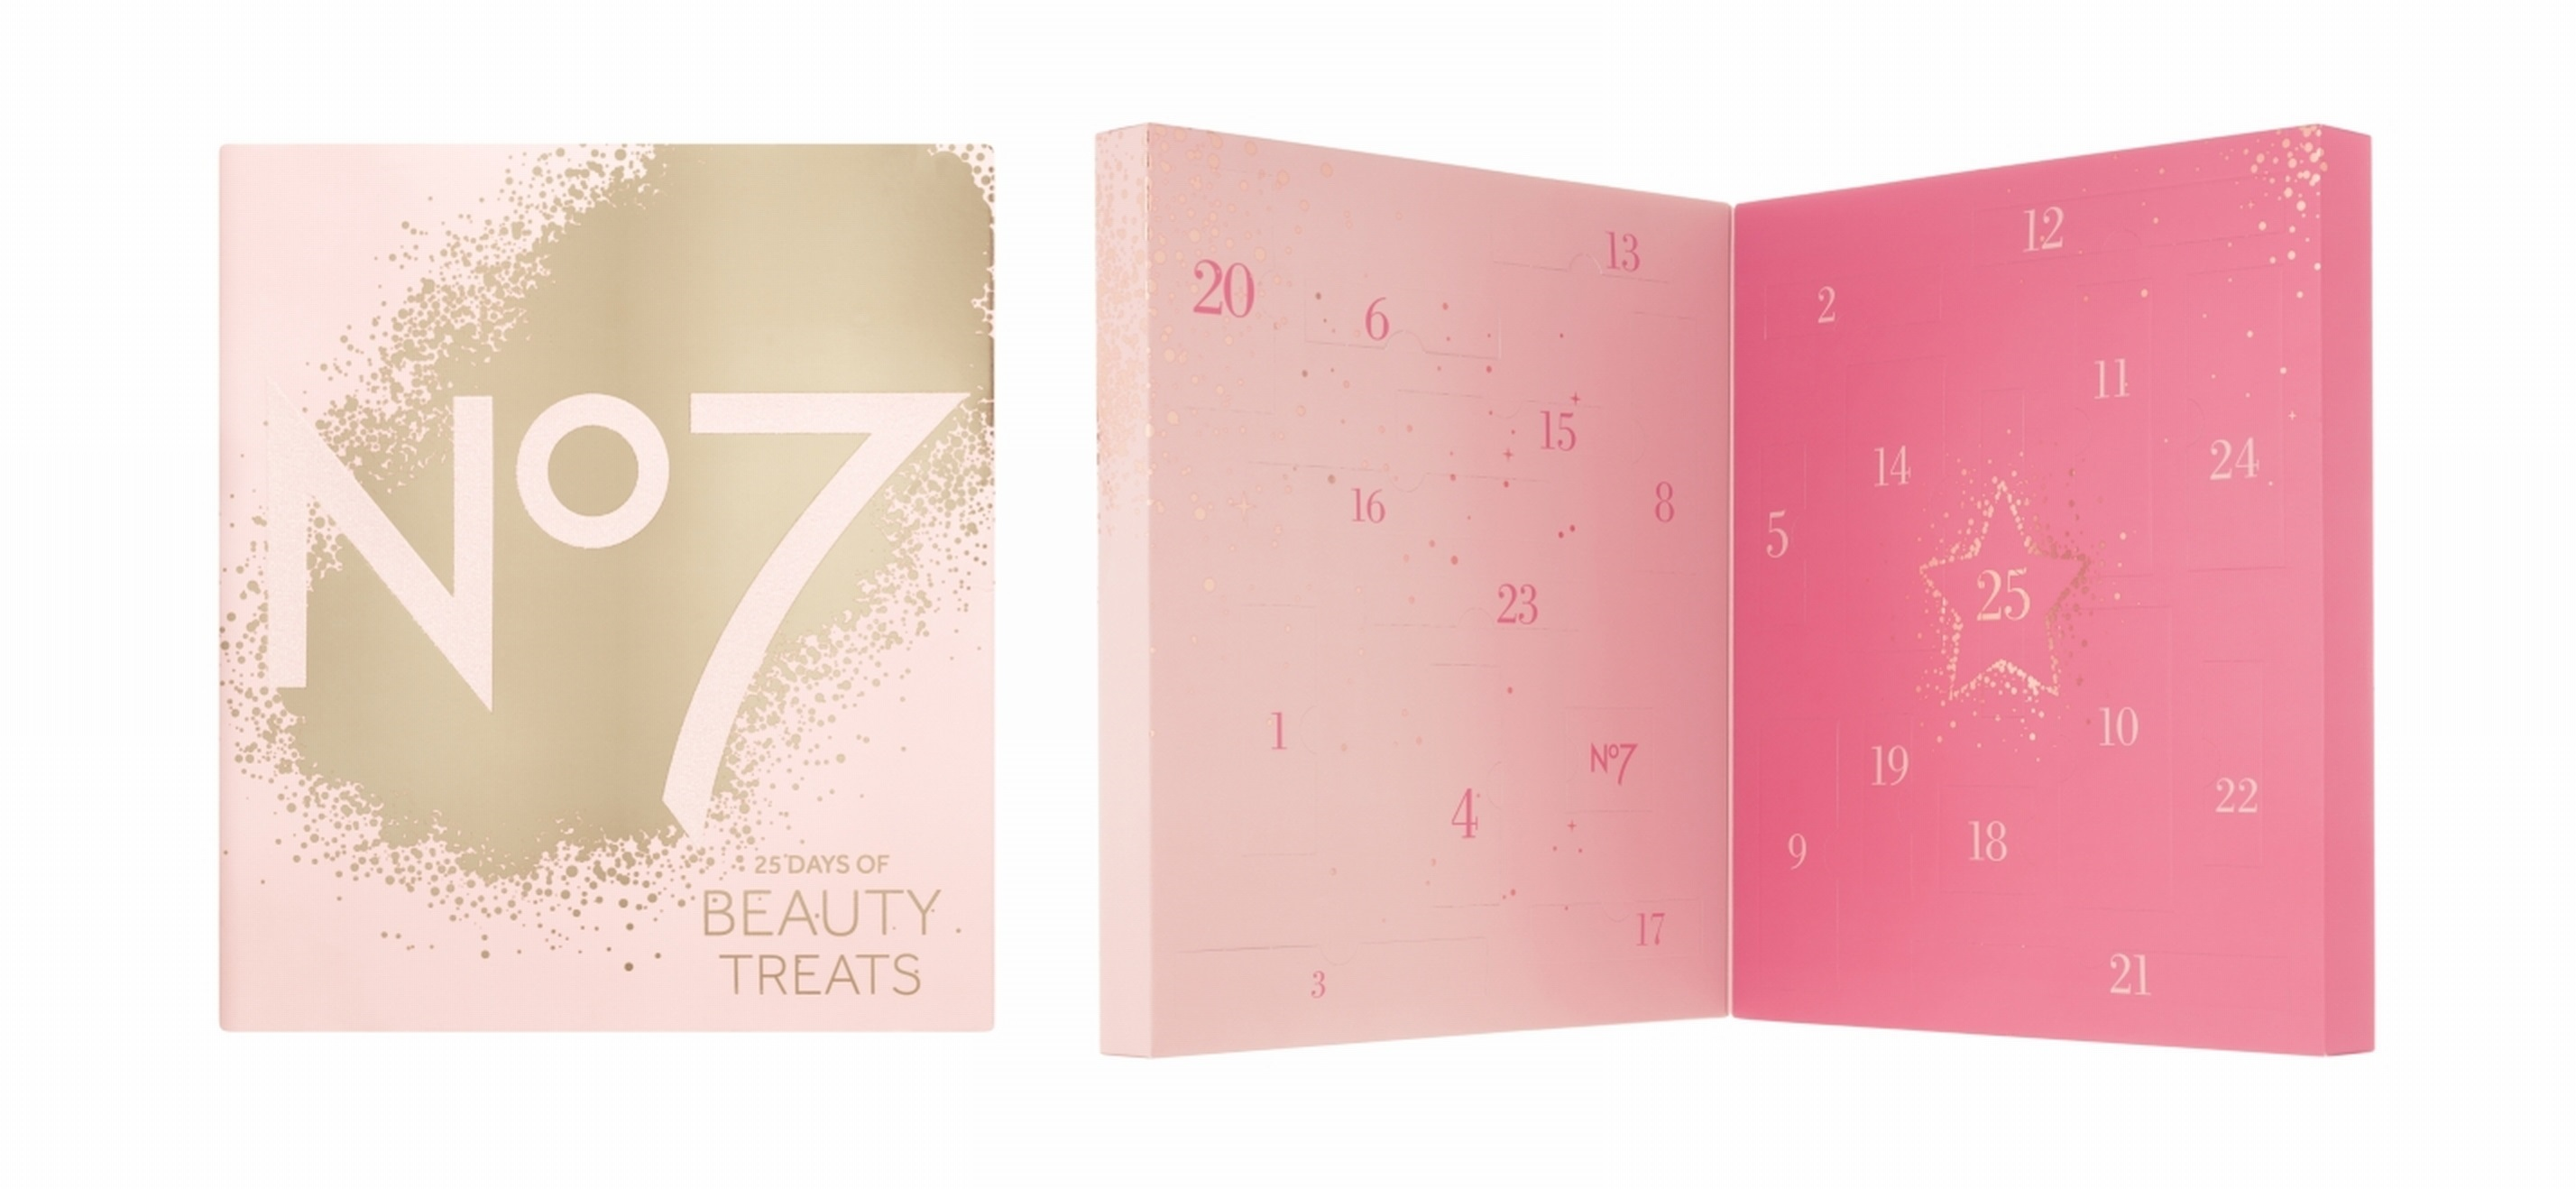 No7 Advent Calendar Has Launched Online